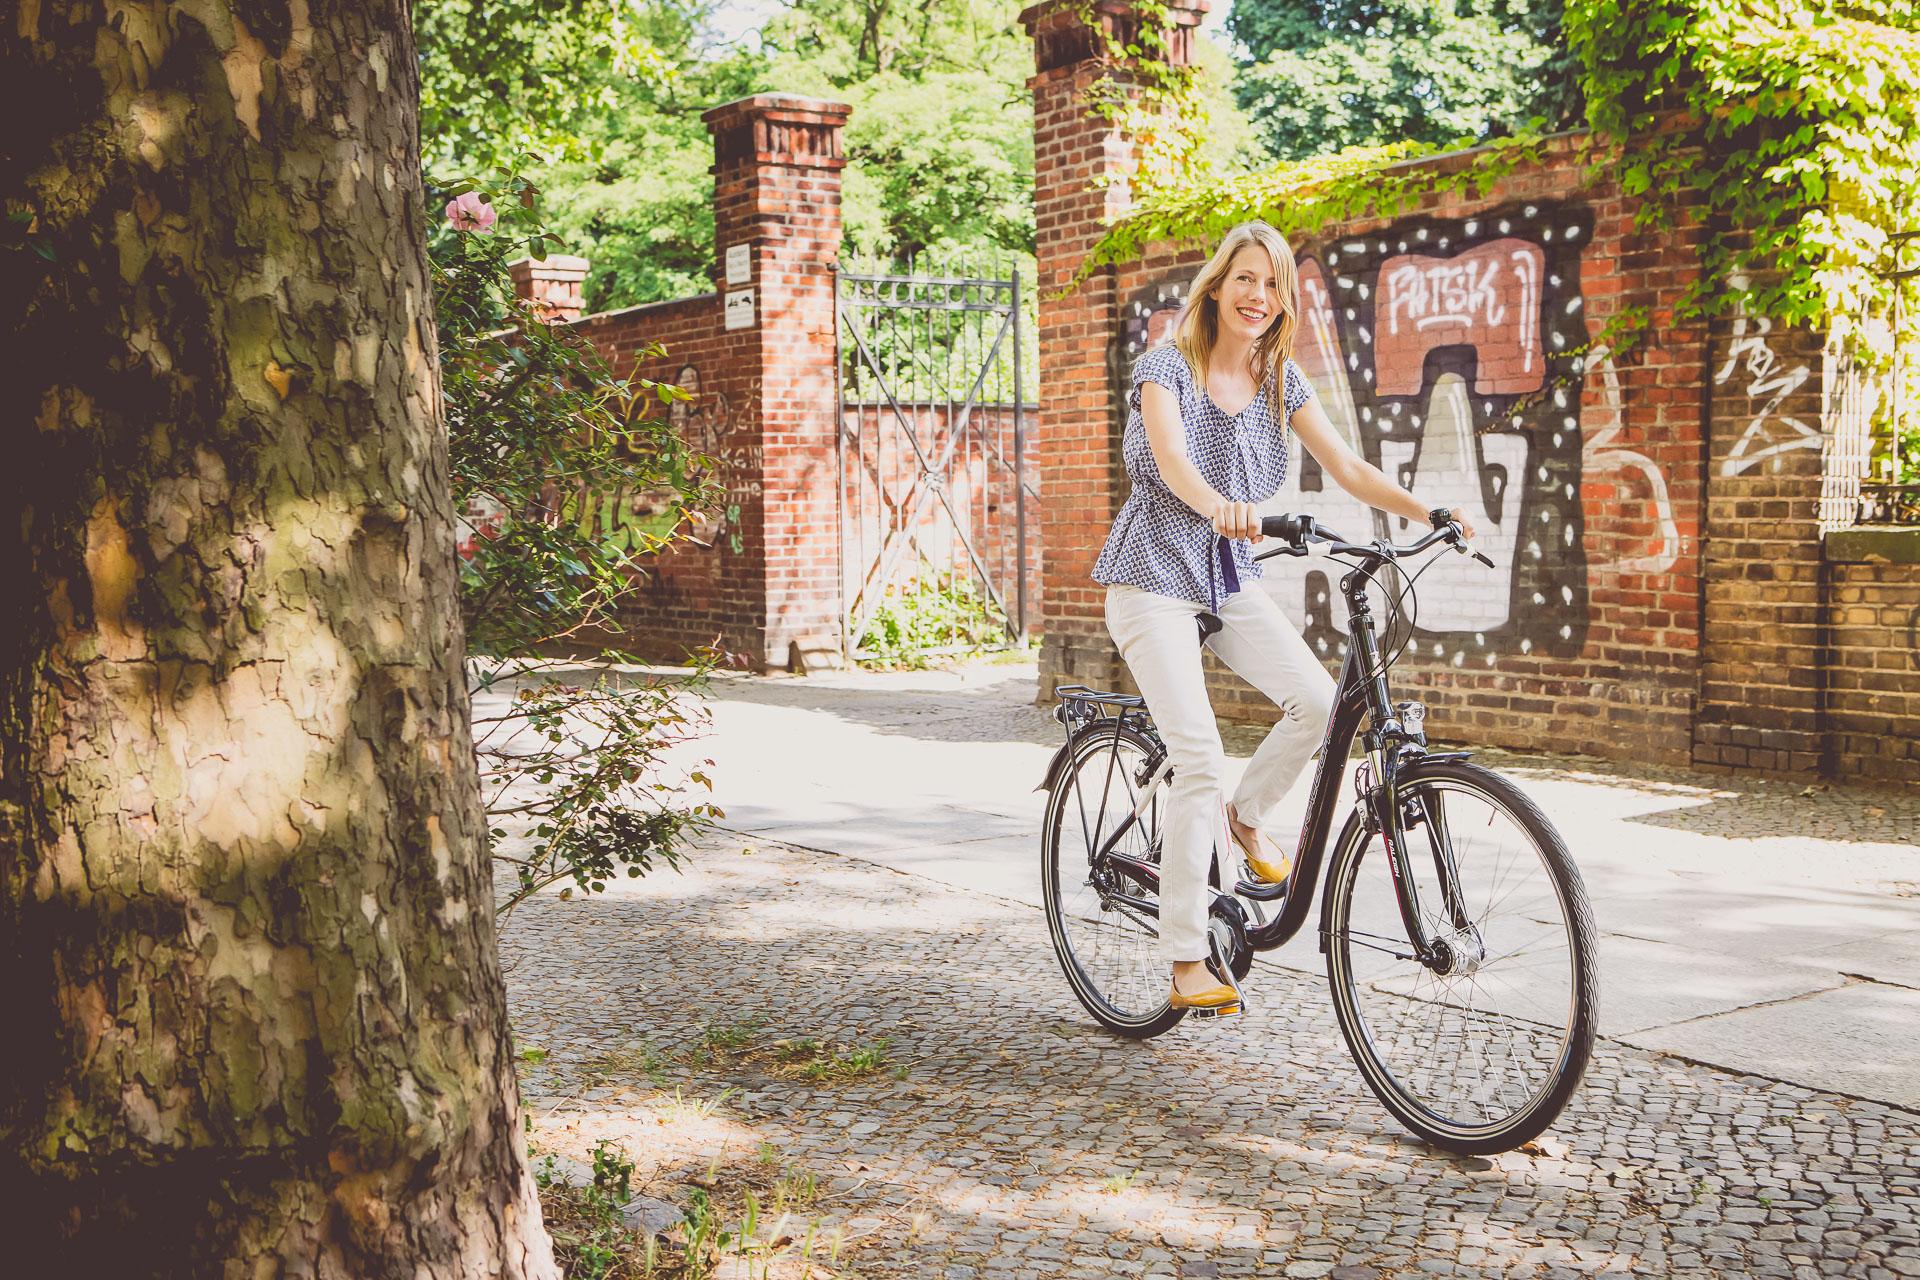 03-Raleigh-Fahrrad-Katalog